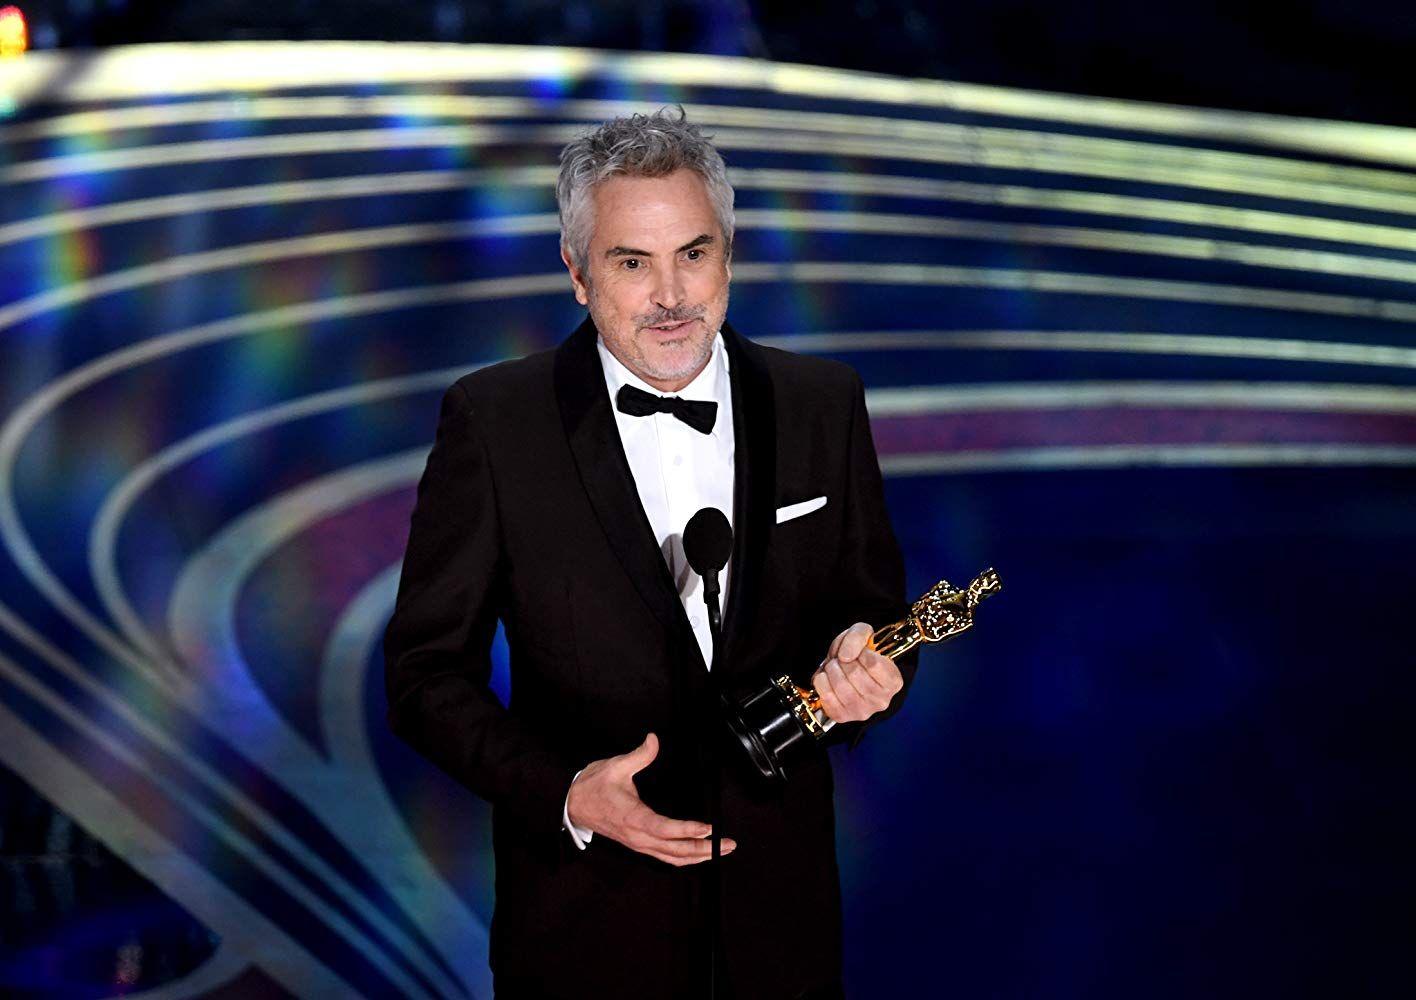 Oscar 2019 La 91ª Edizione Della Cerimonia Degli Oscar Film Stranieri Regina King Bradley Cooper